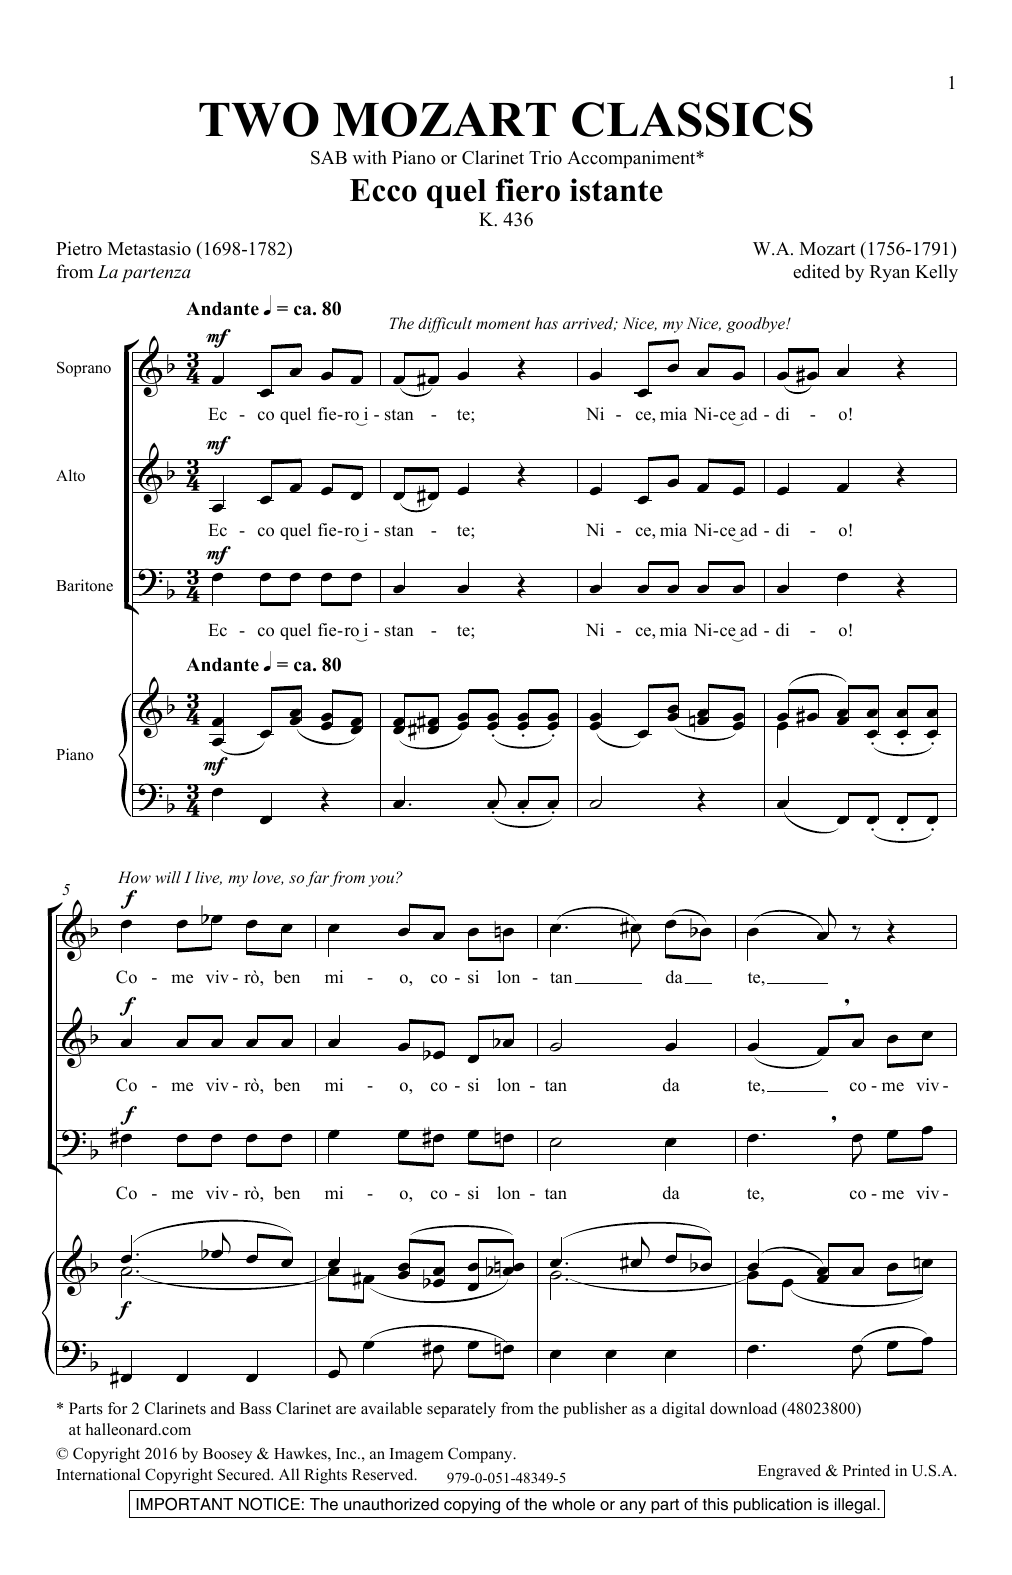 Two Mozart Classics Sheet Music